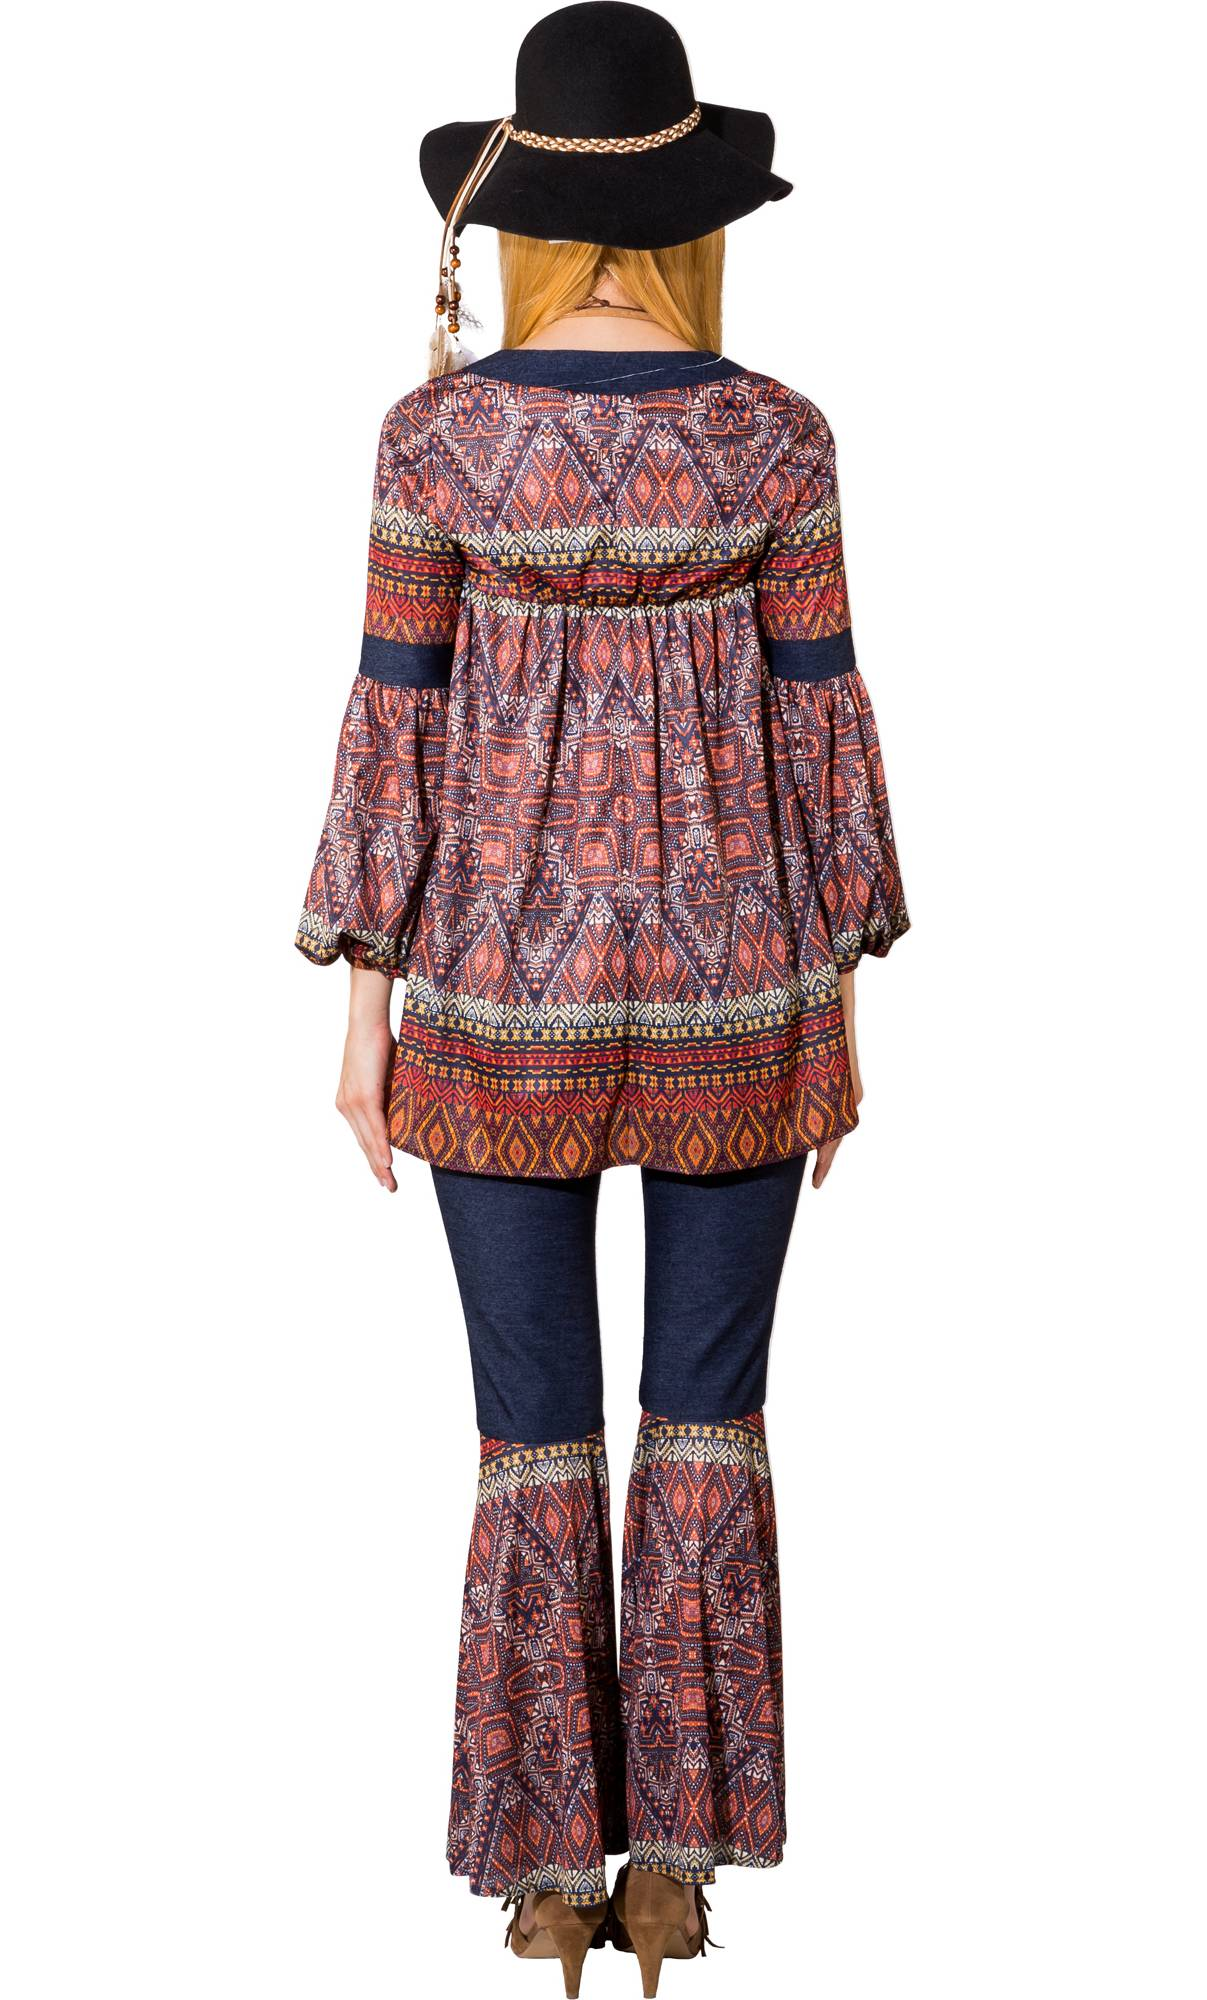 Costume-Hippie-femme-grande-taille-3